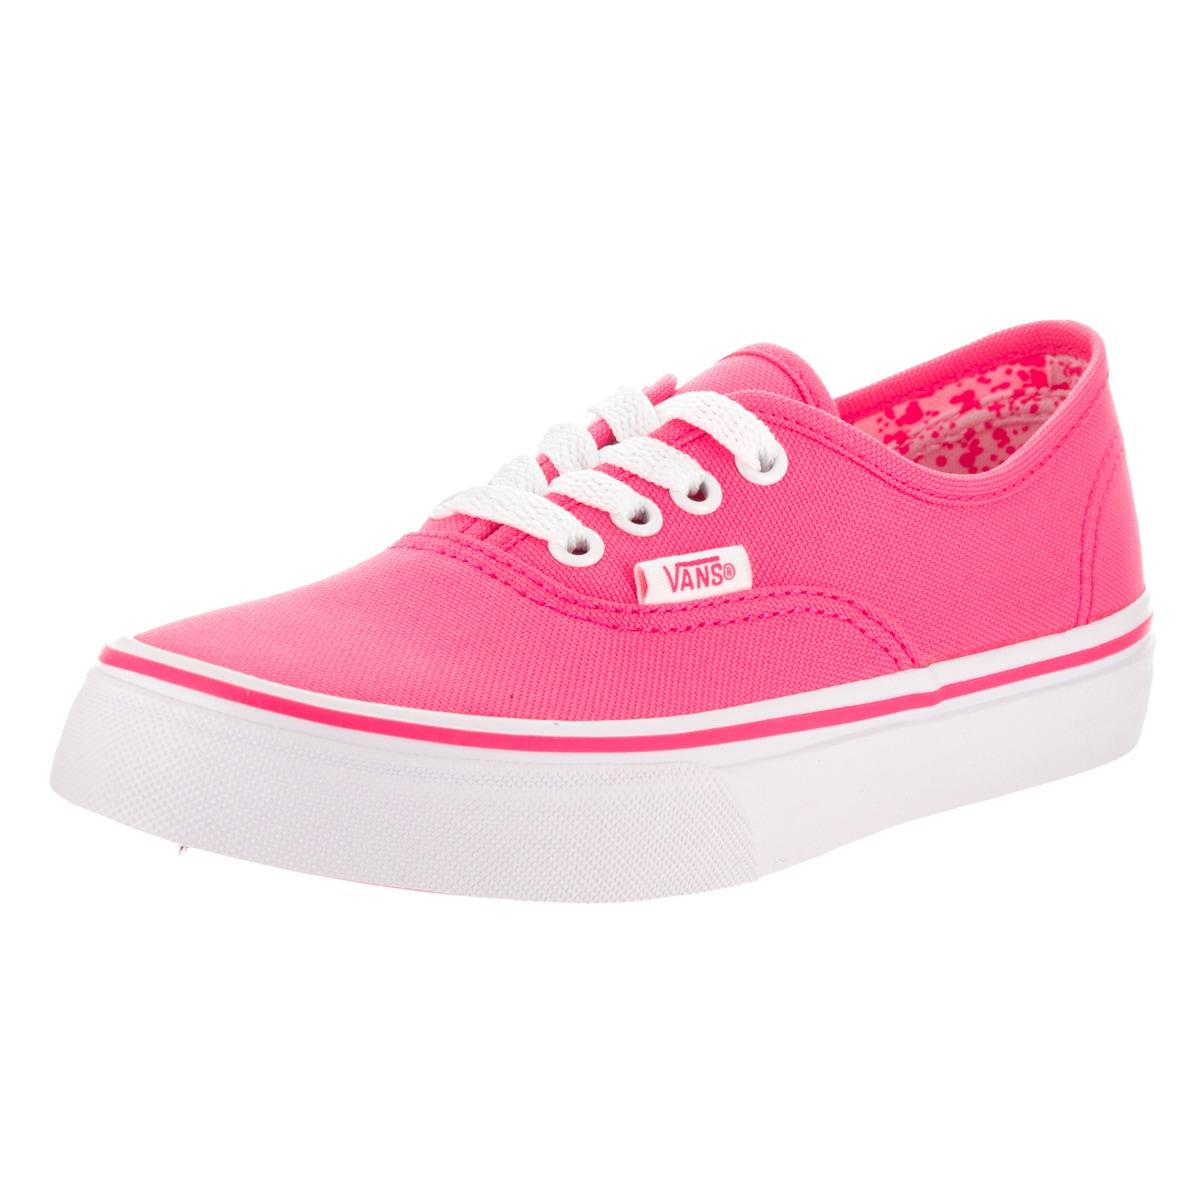 Vans Kid's Pink Neon Splatter Canvas Authentic Skate Shoe...